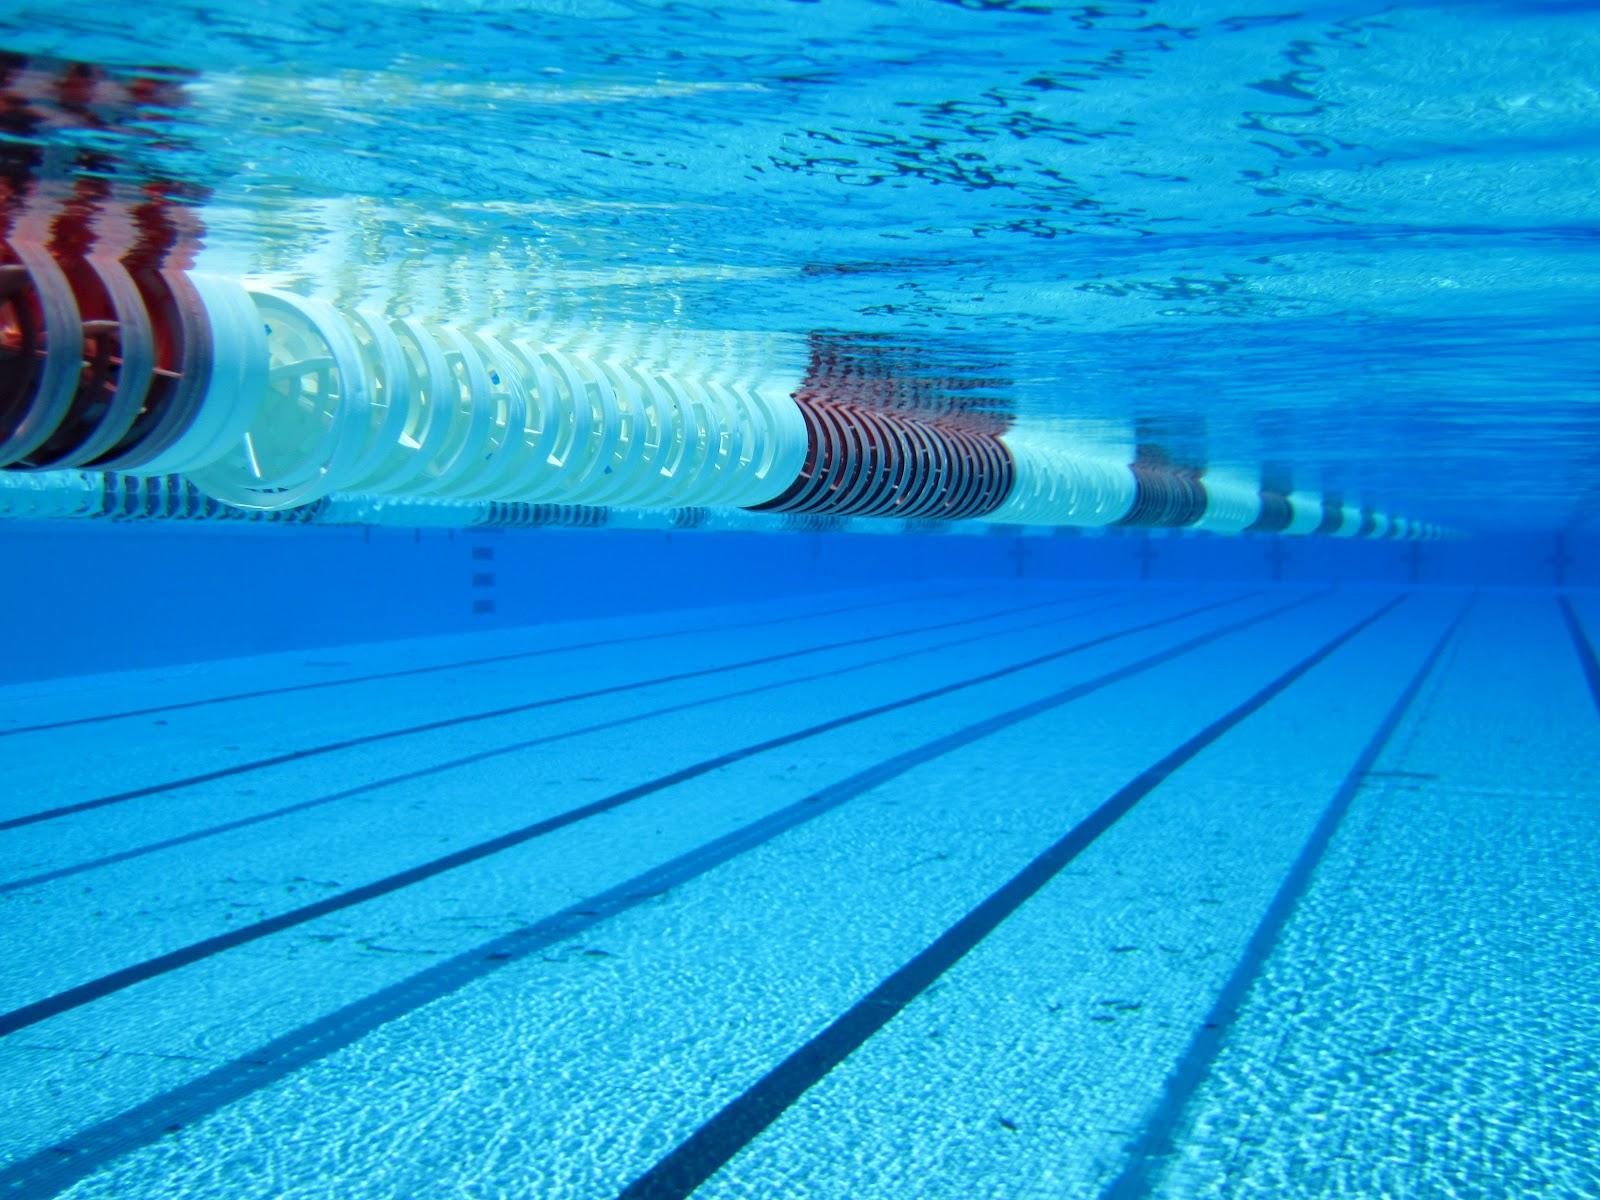 Mr Bean Swimming Pool HD